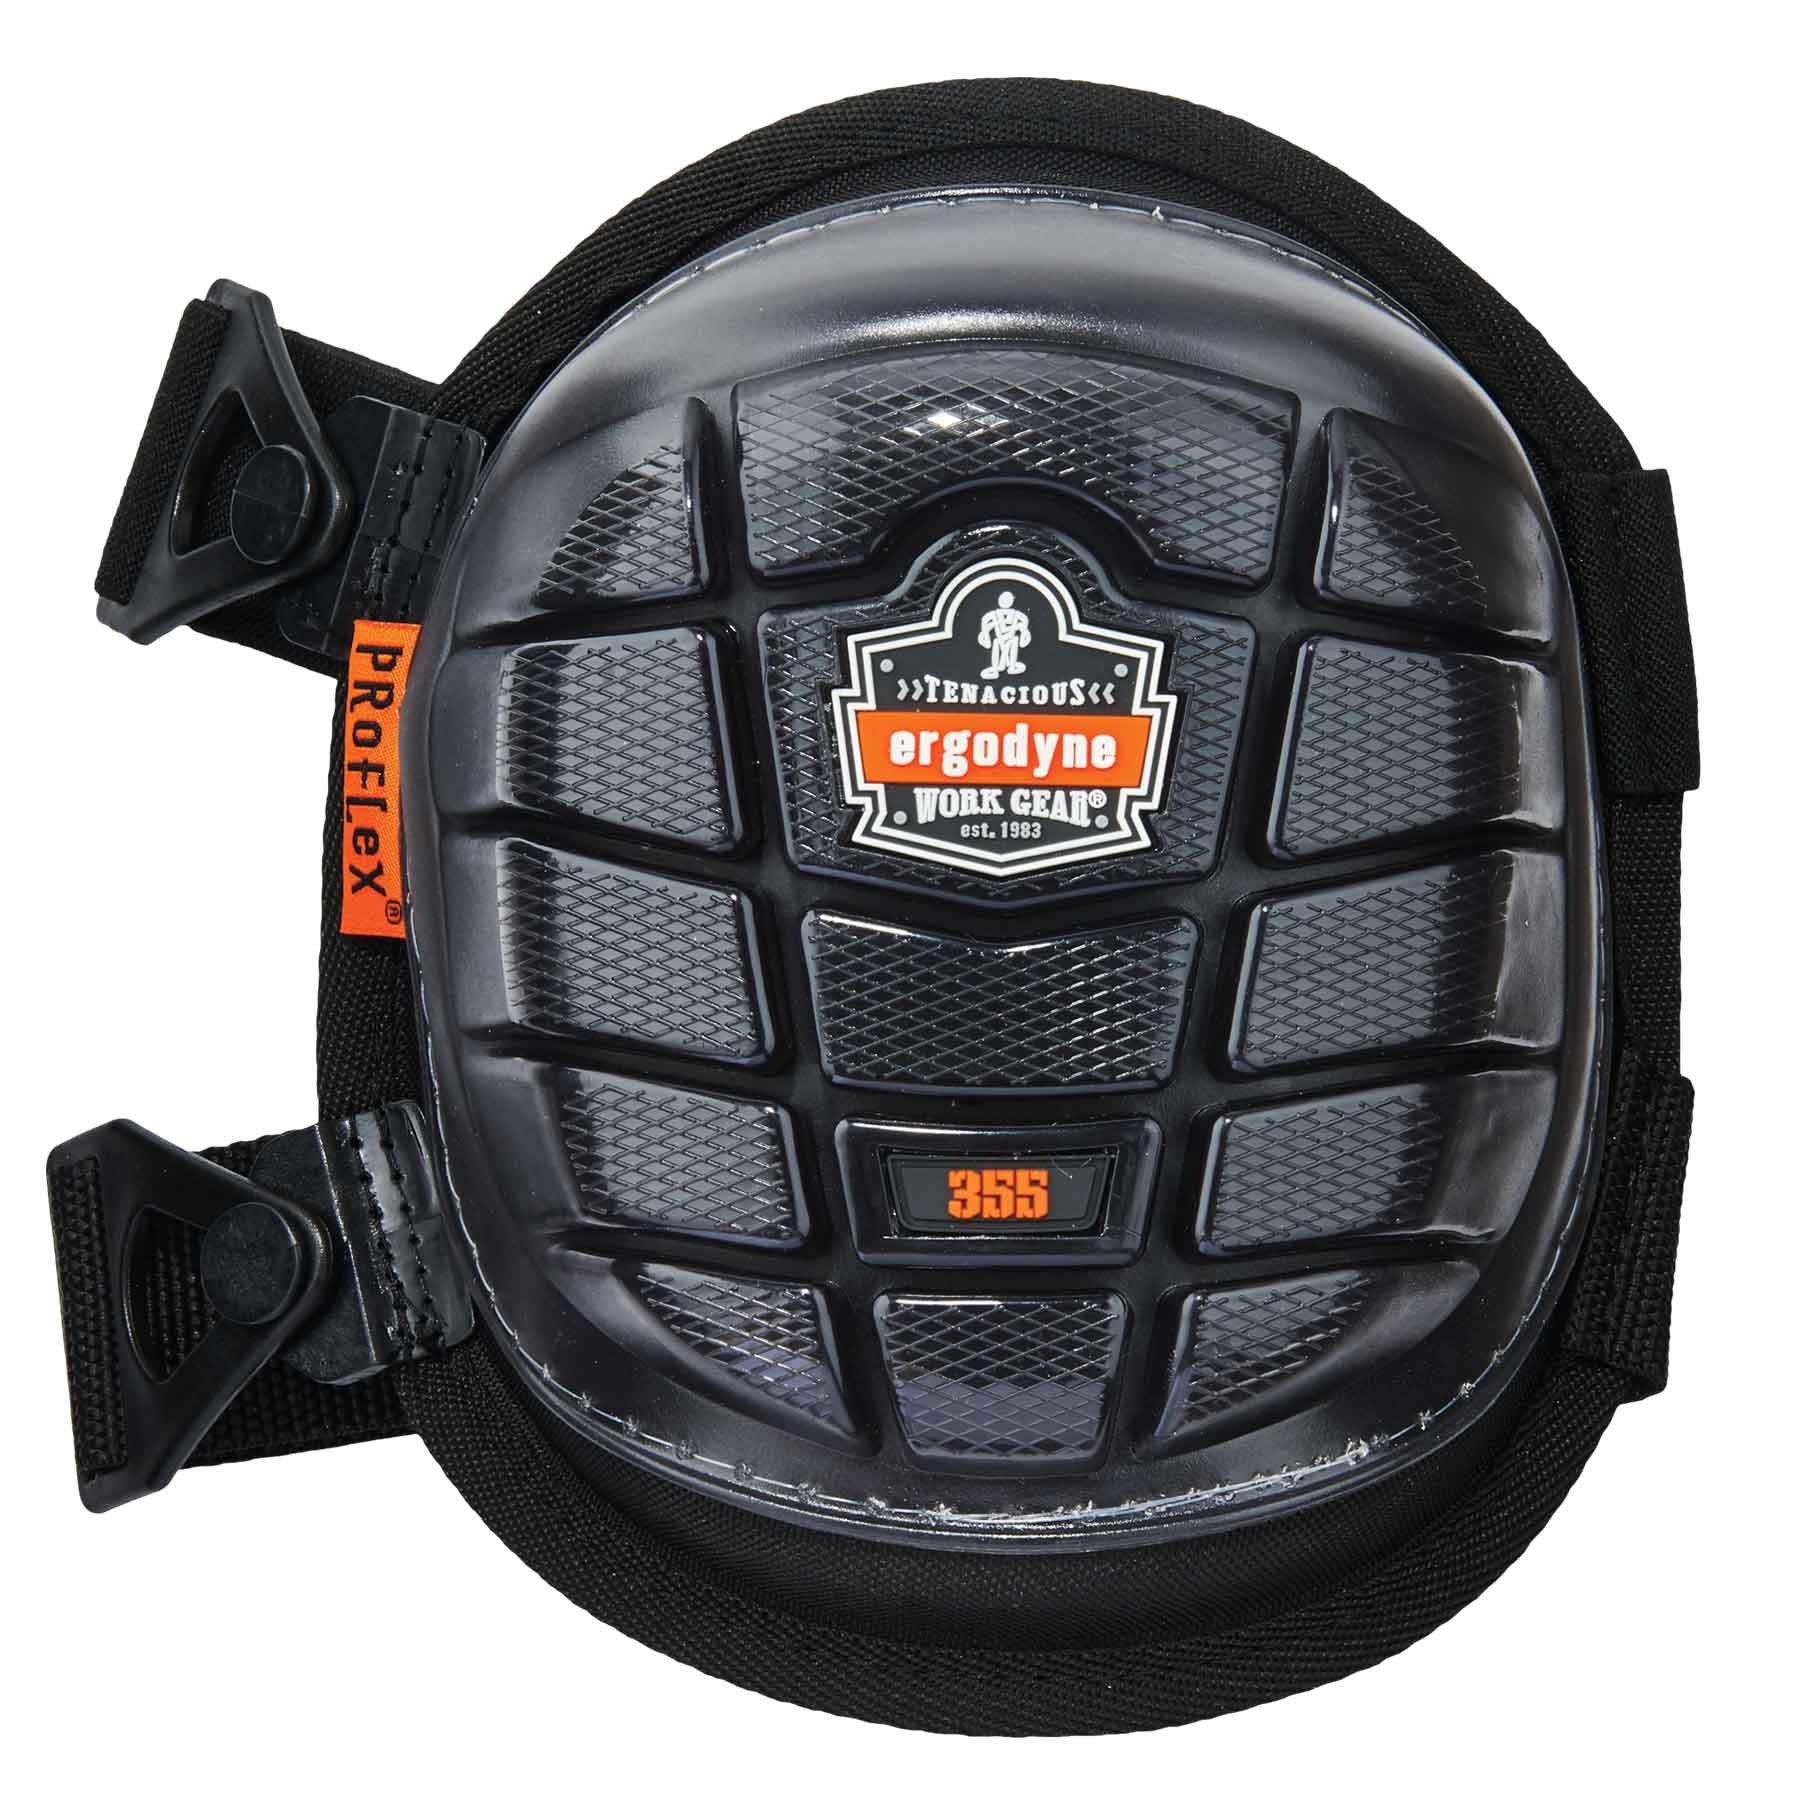 Ergodyne ProFlex 355 Professional Knee Pads, Protective Short Cap, Injected Gel Padded Technology, Adjustable Straps, Black